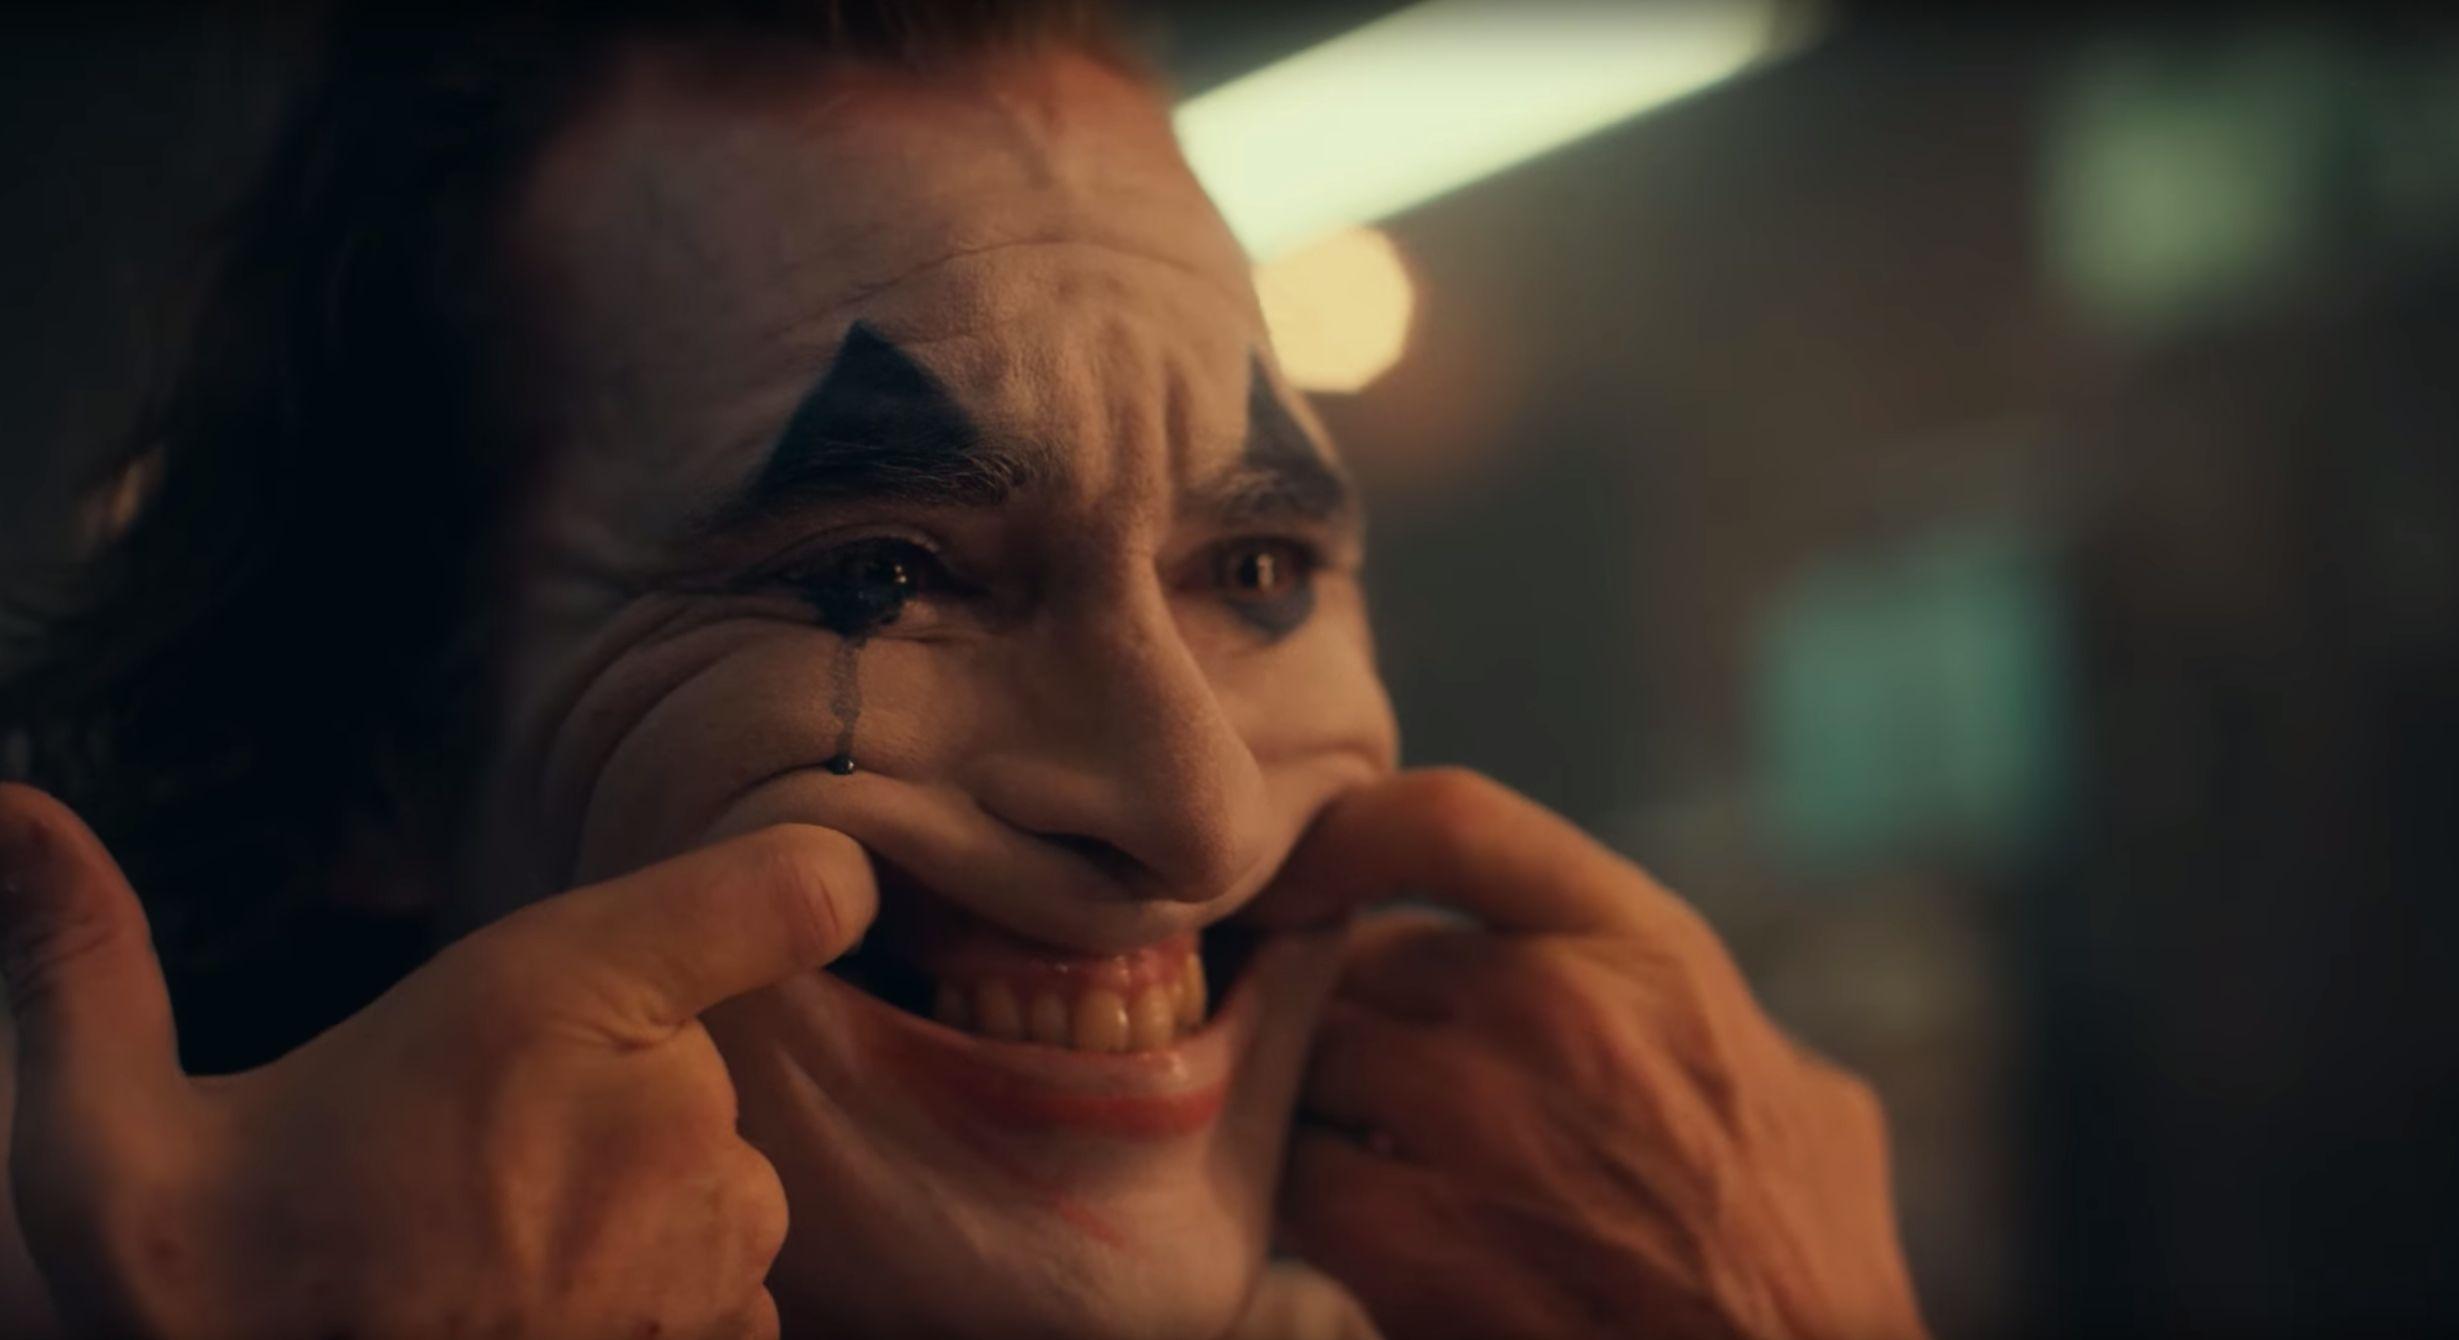 New Joker Trailer Offers Fans First Glimpse At Joaquin Phoenix In